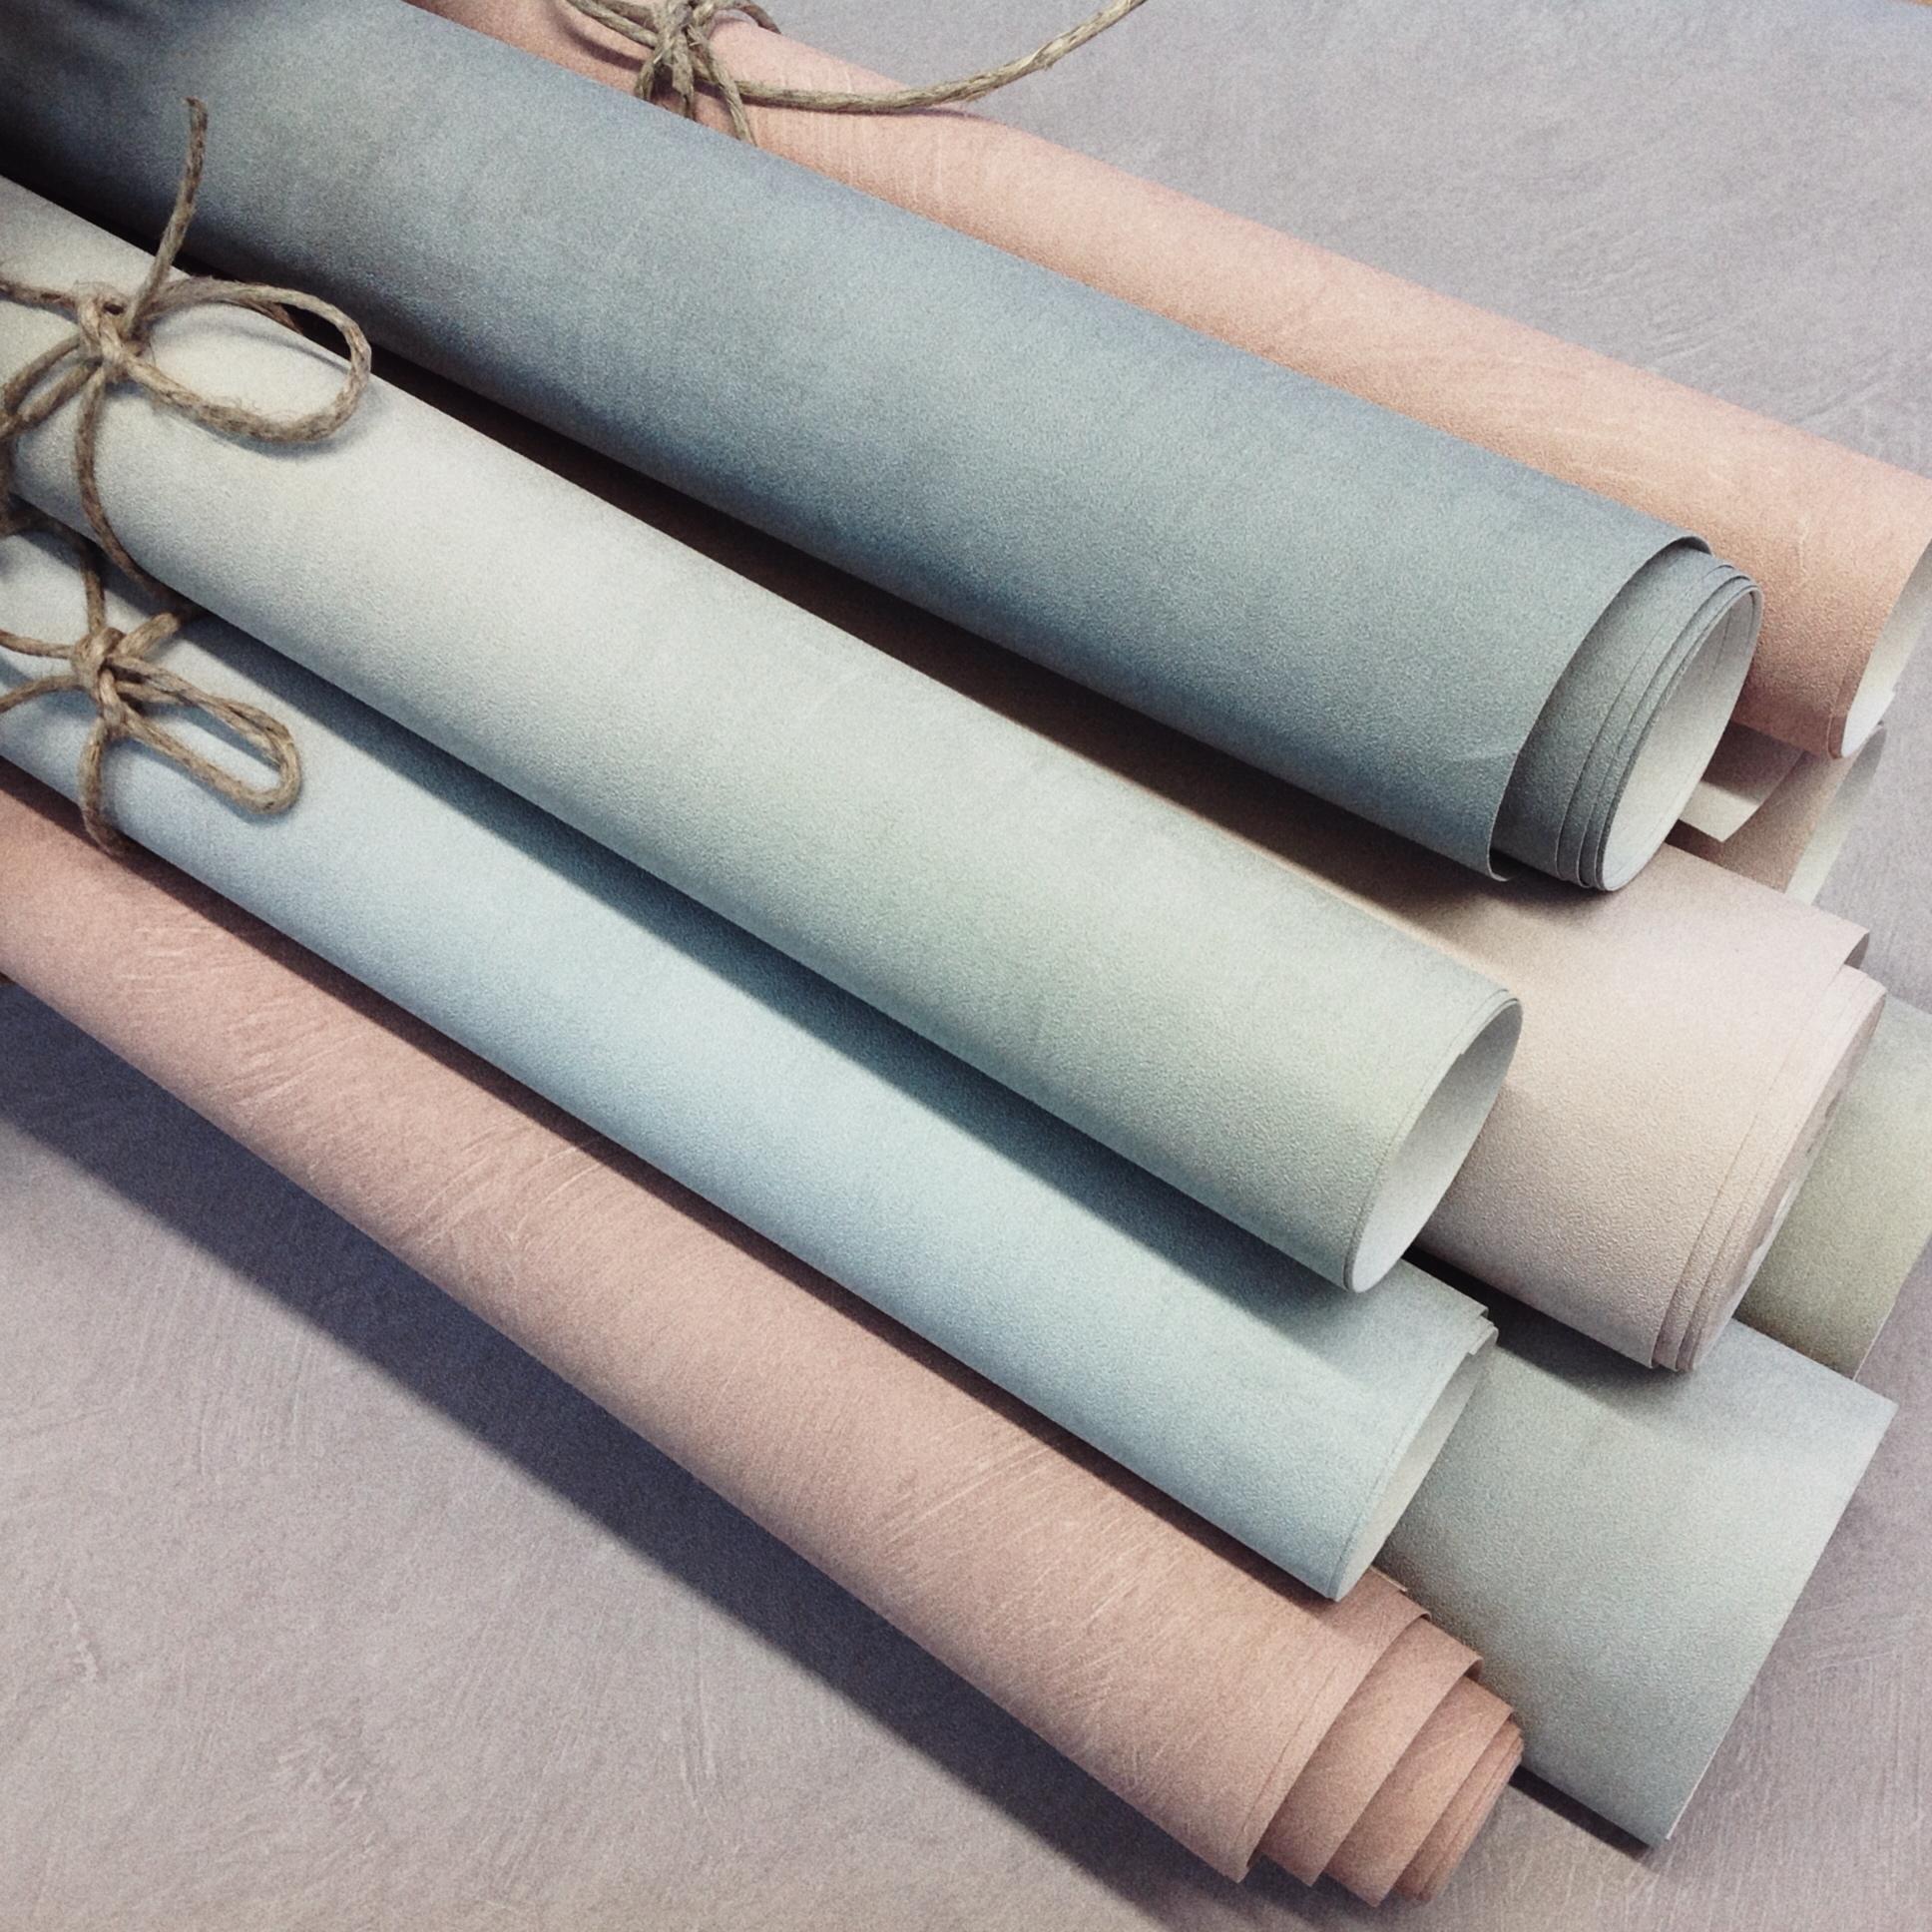 kalkytan-Kalk-tapeter-pastellfärger-midbec